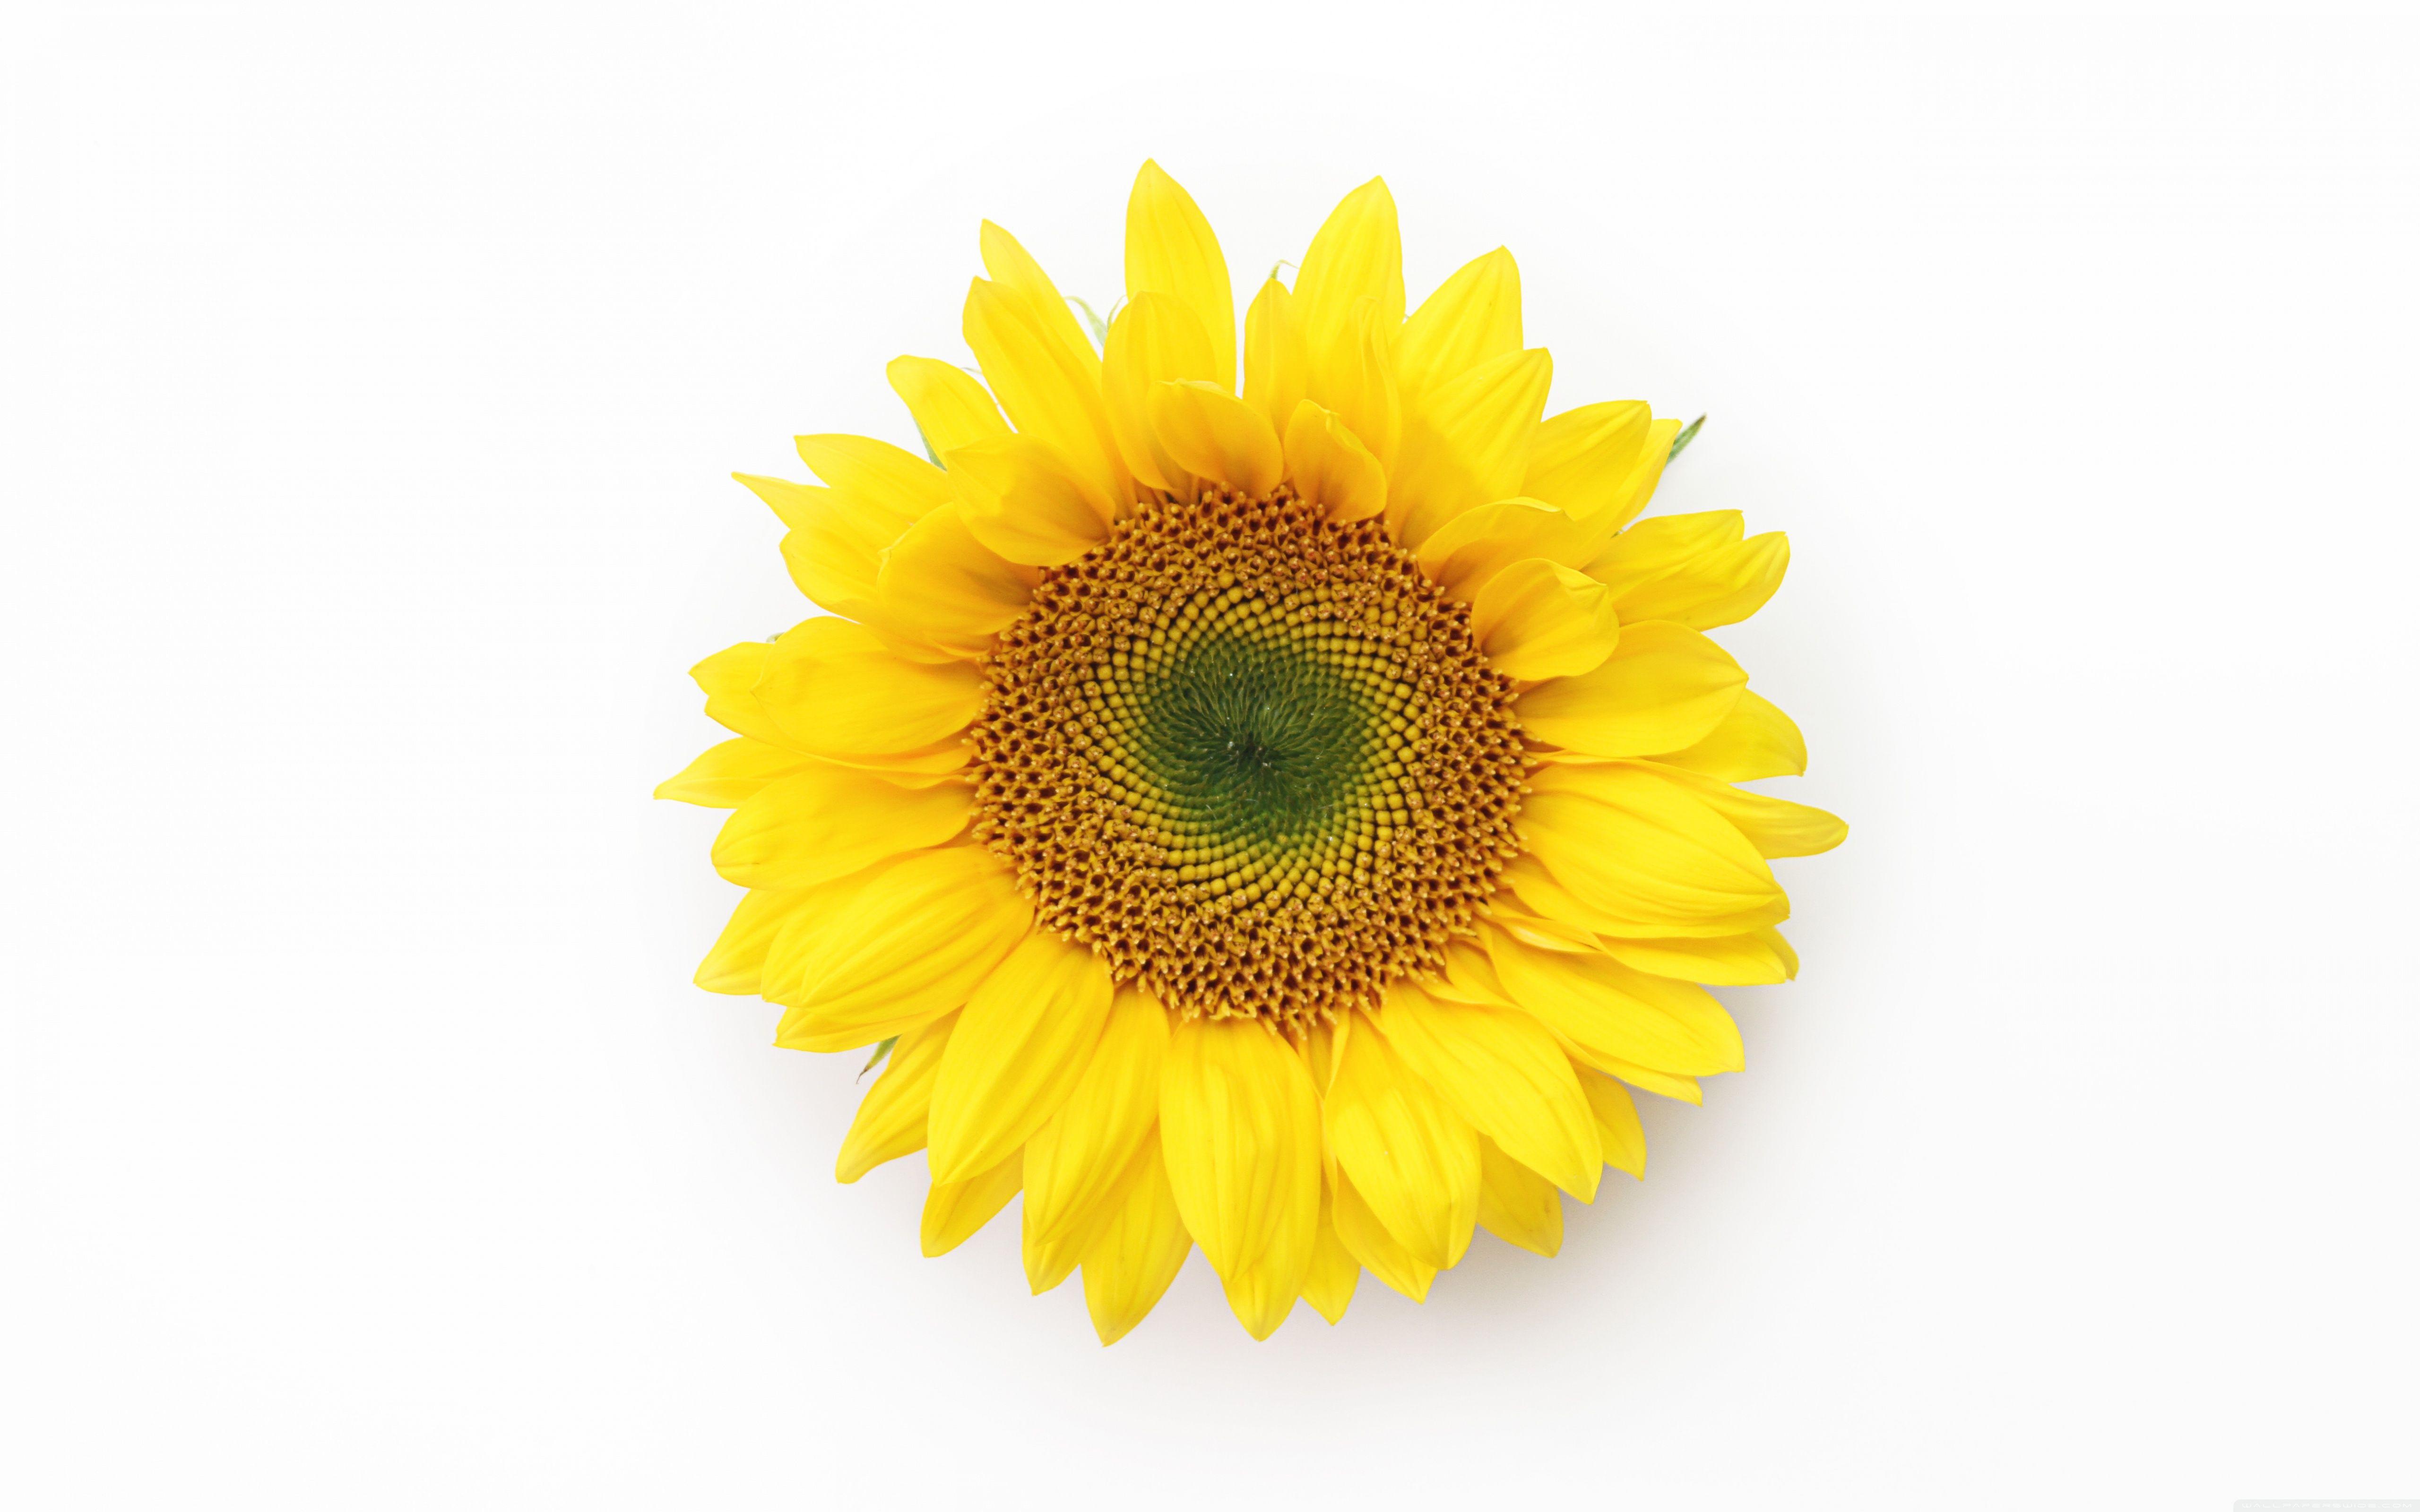 sunflower tumblr background